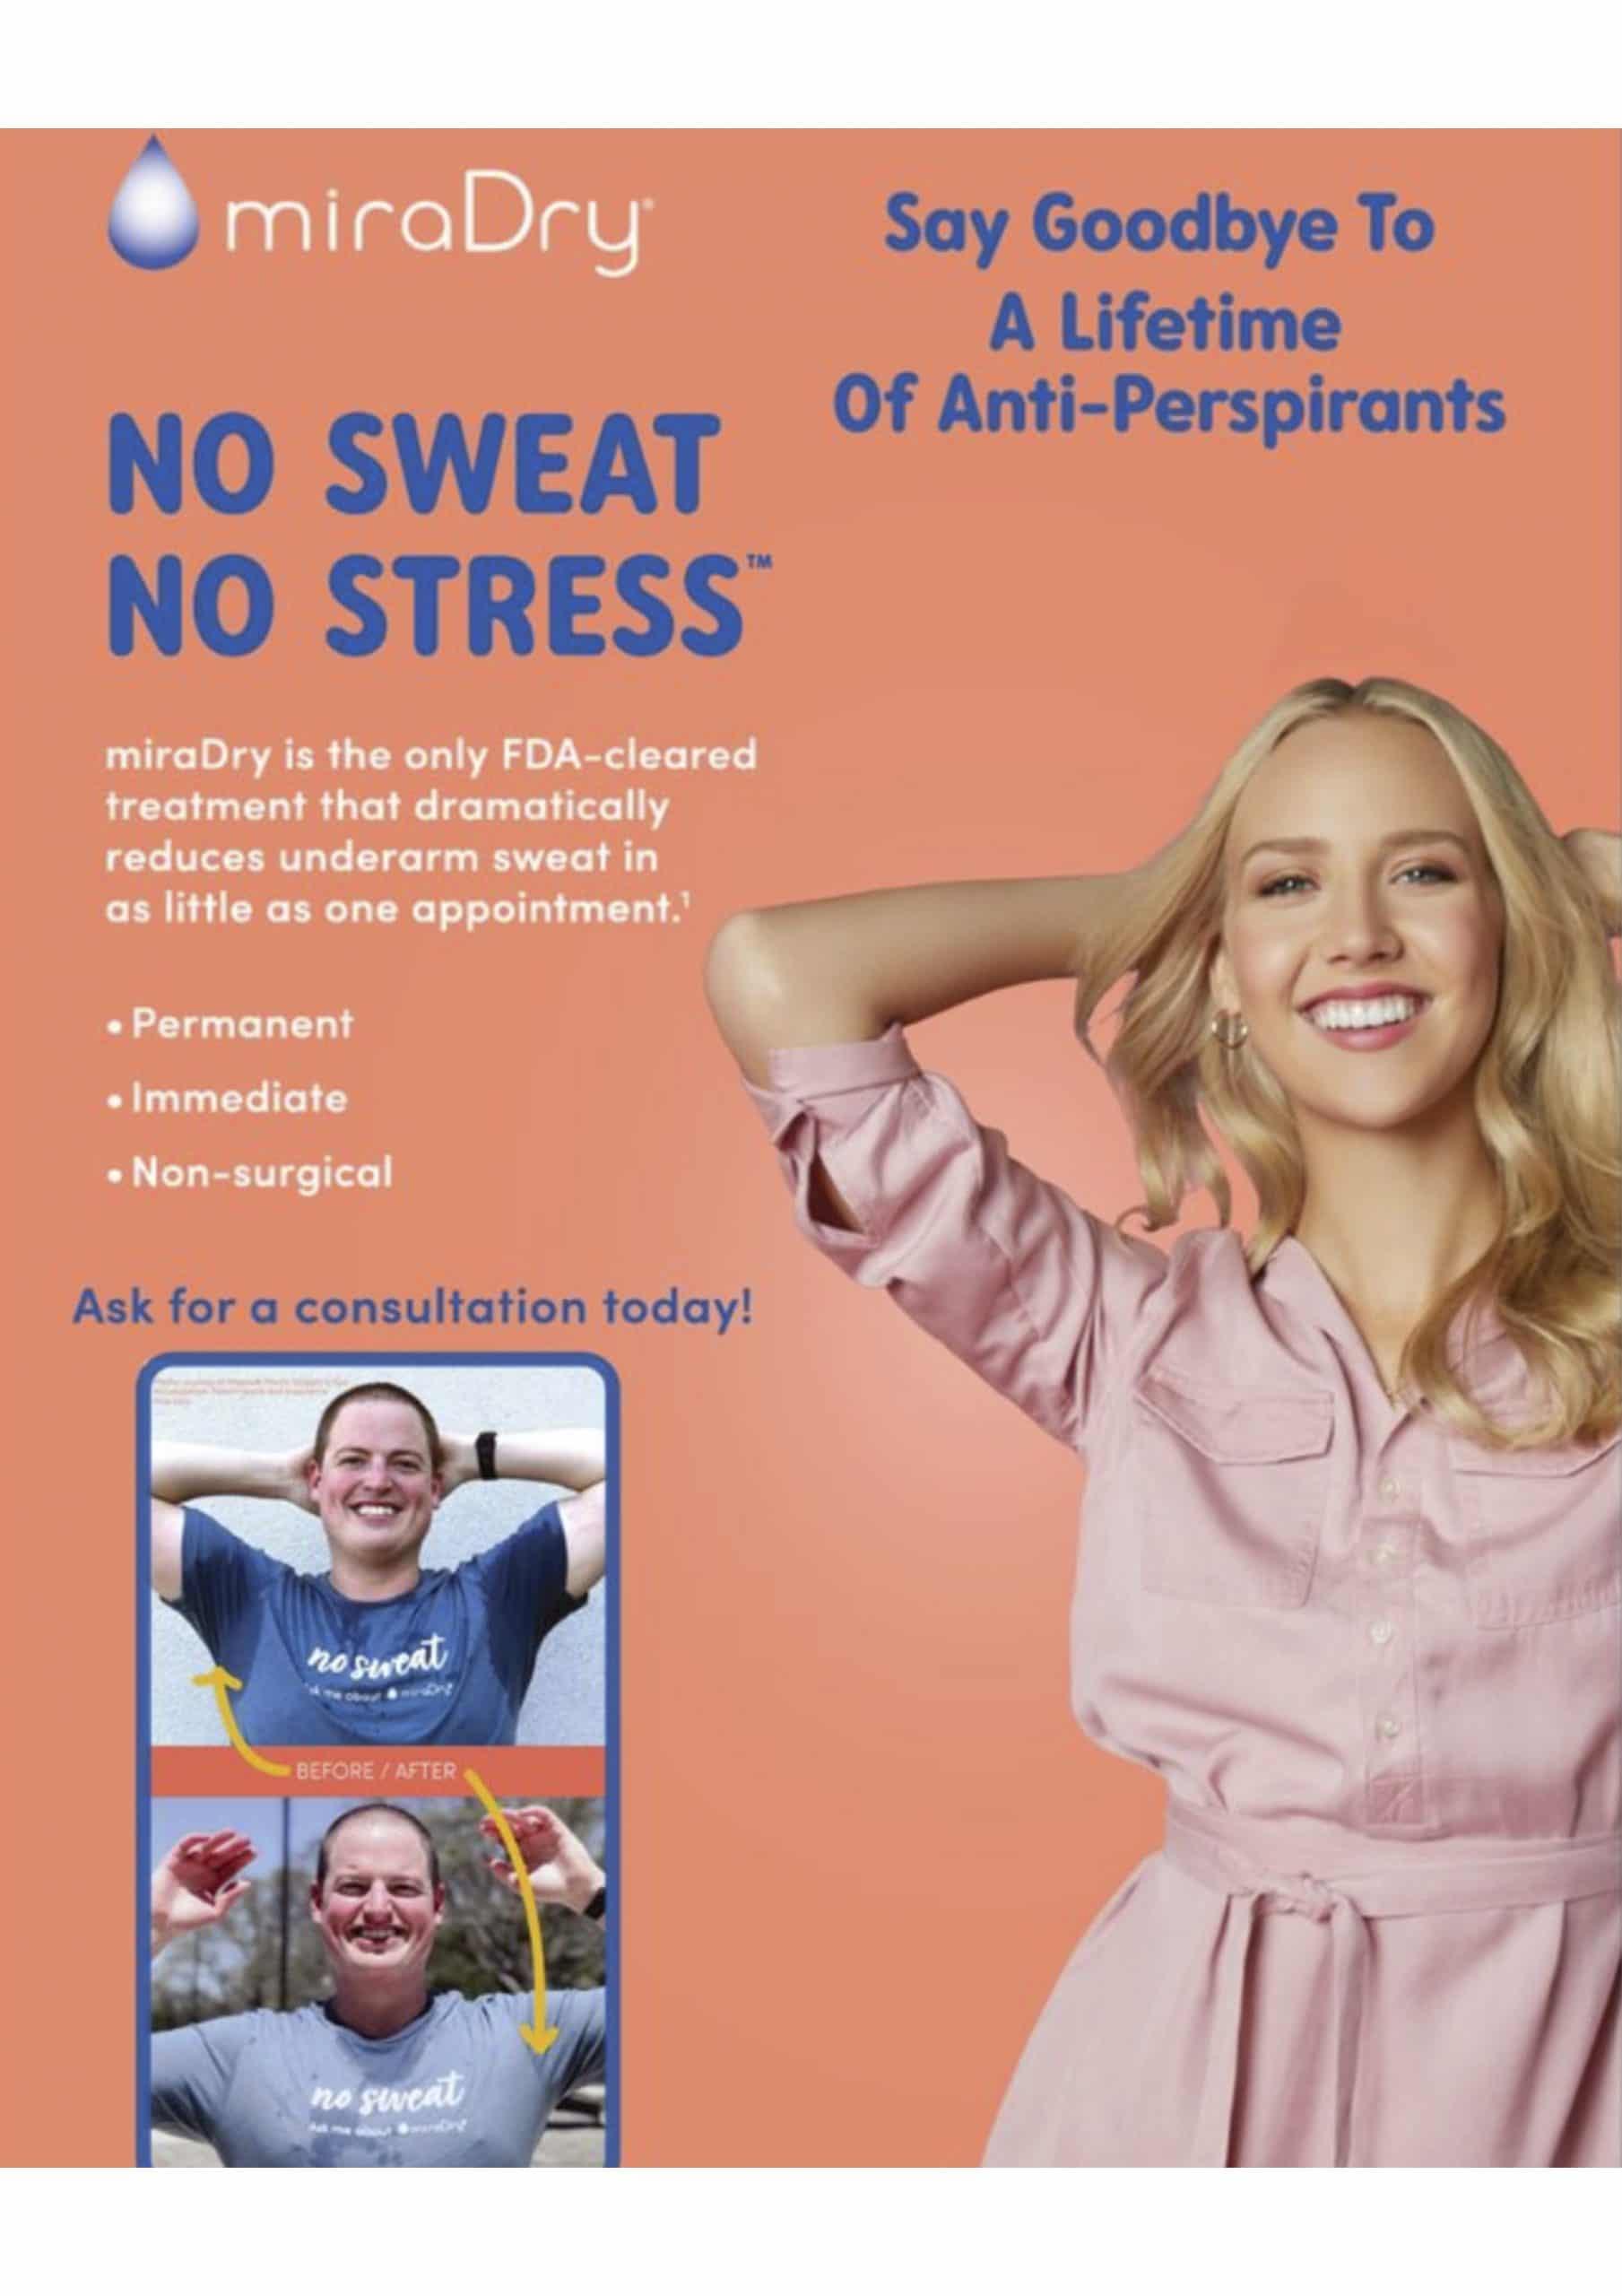 miraDry - No Sweat, No Stress